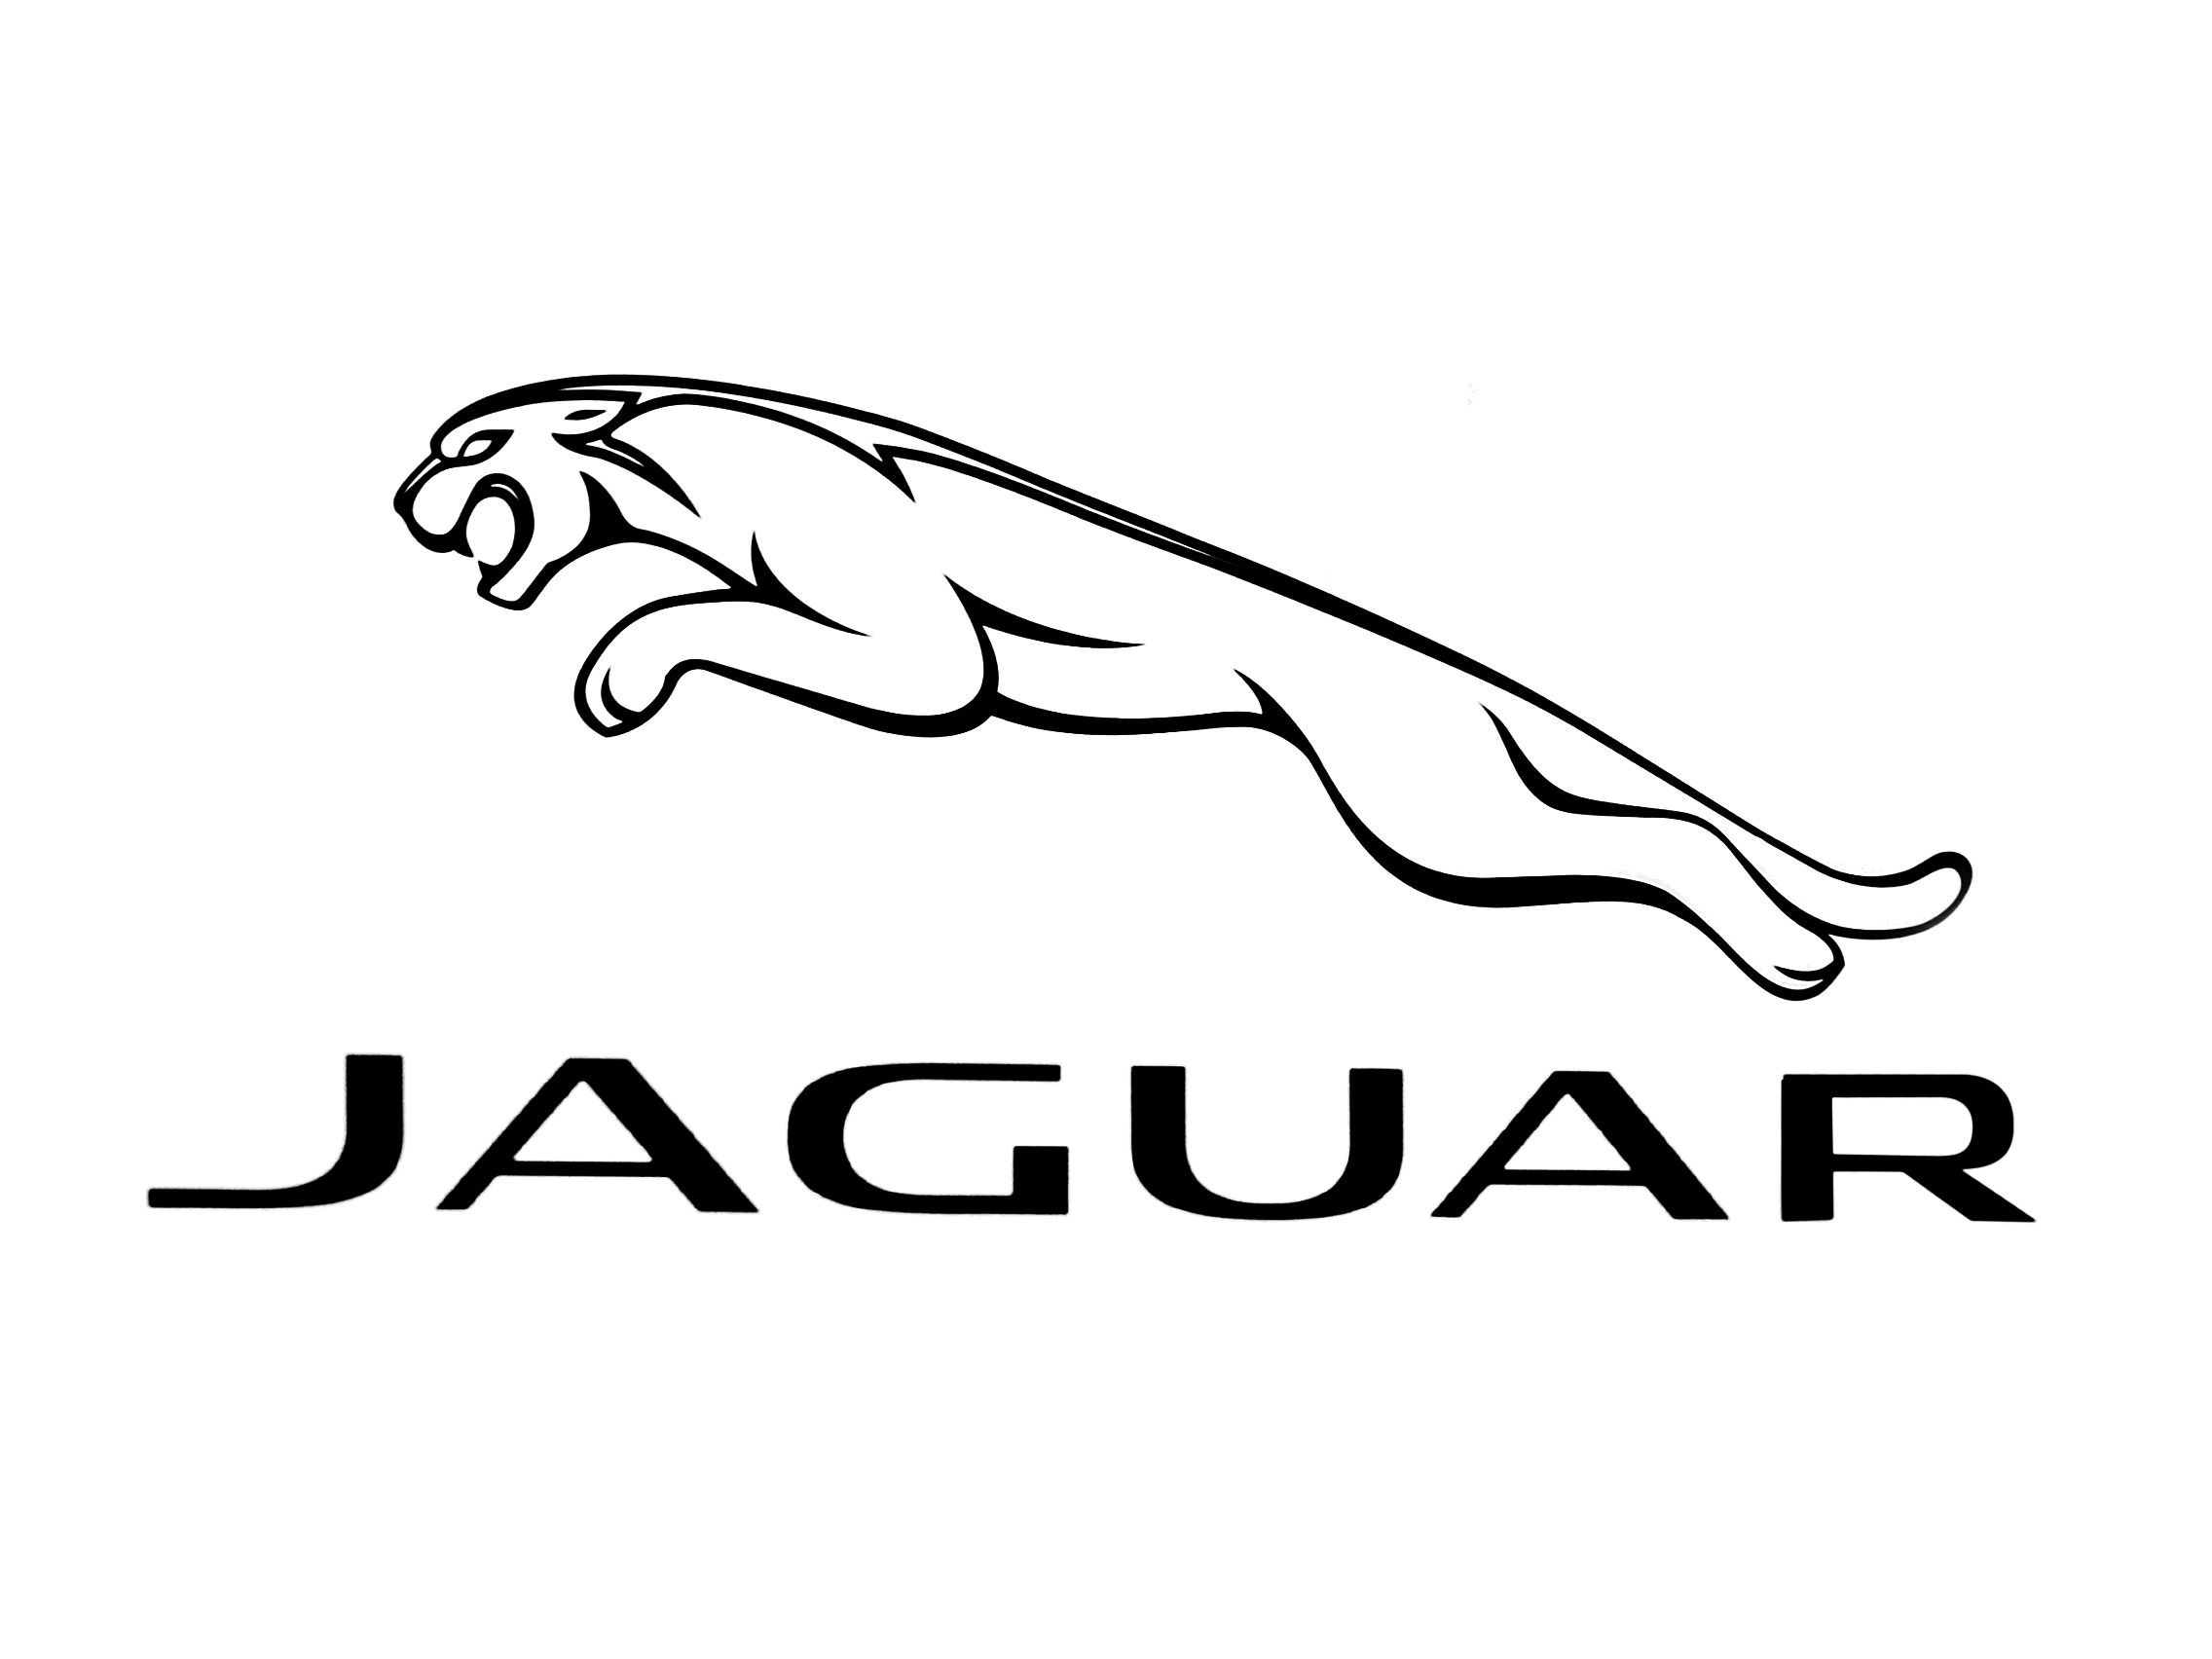 Jaguar Clipart Jag Jaguar Jag Transparent Free For